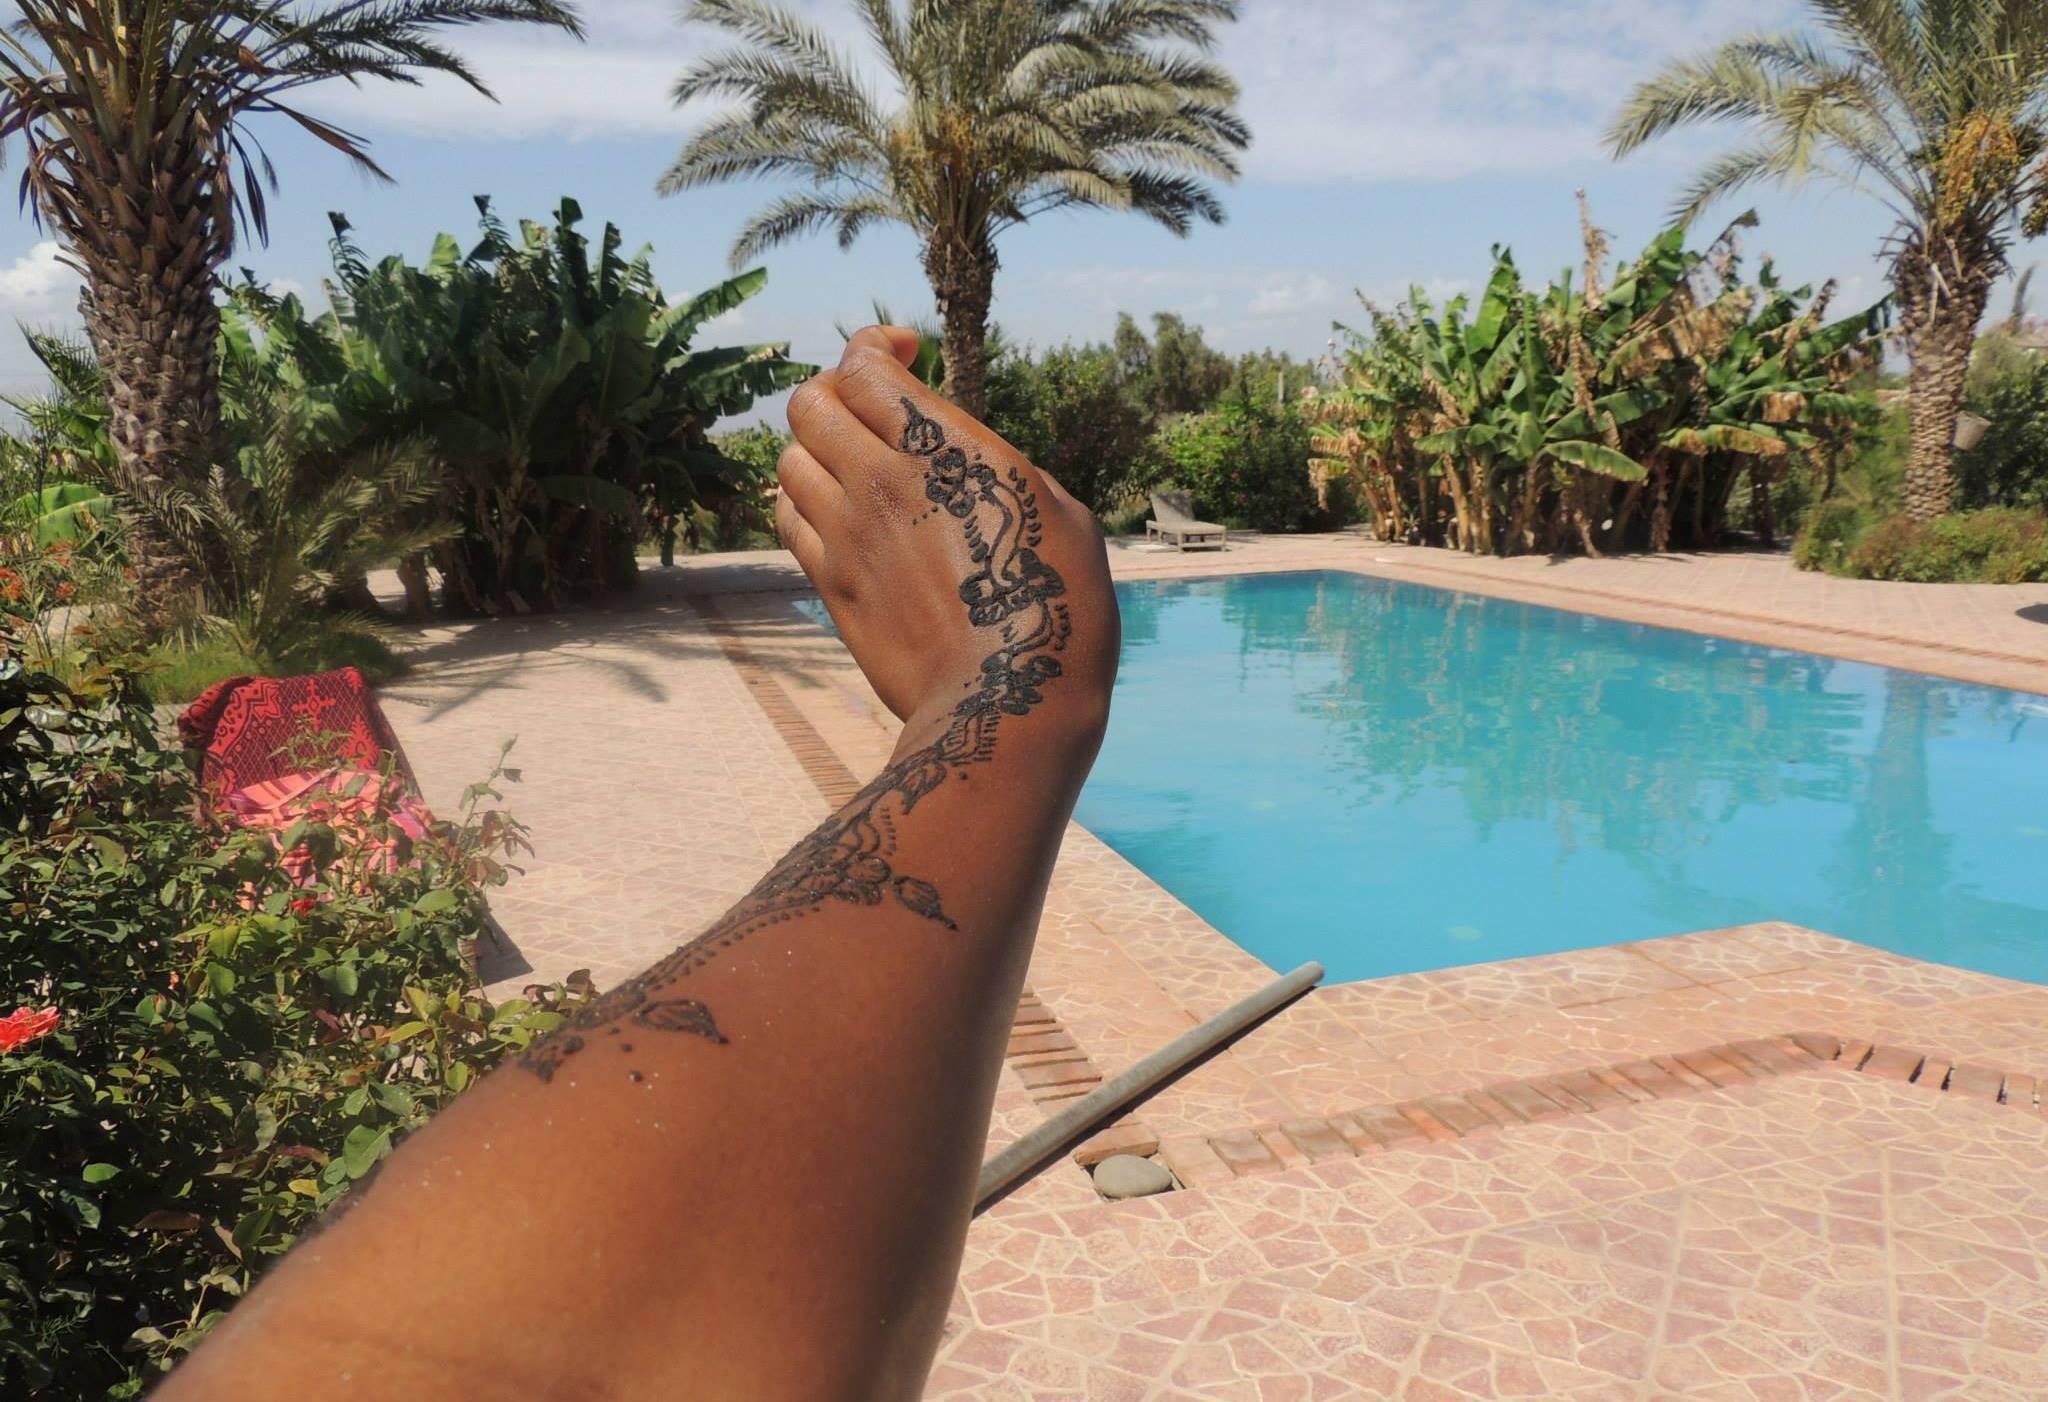 Joli souvenir du Maroc